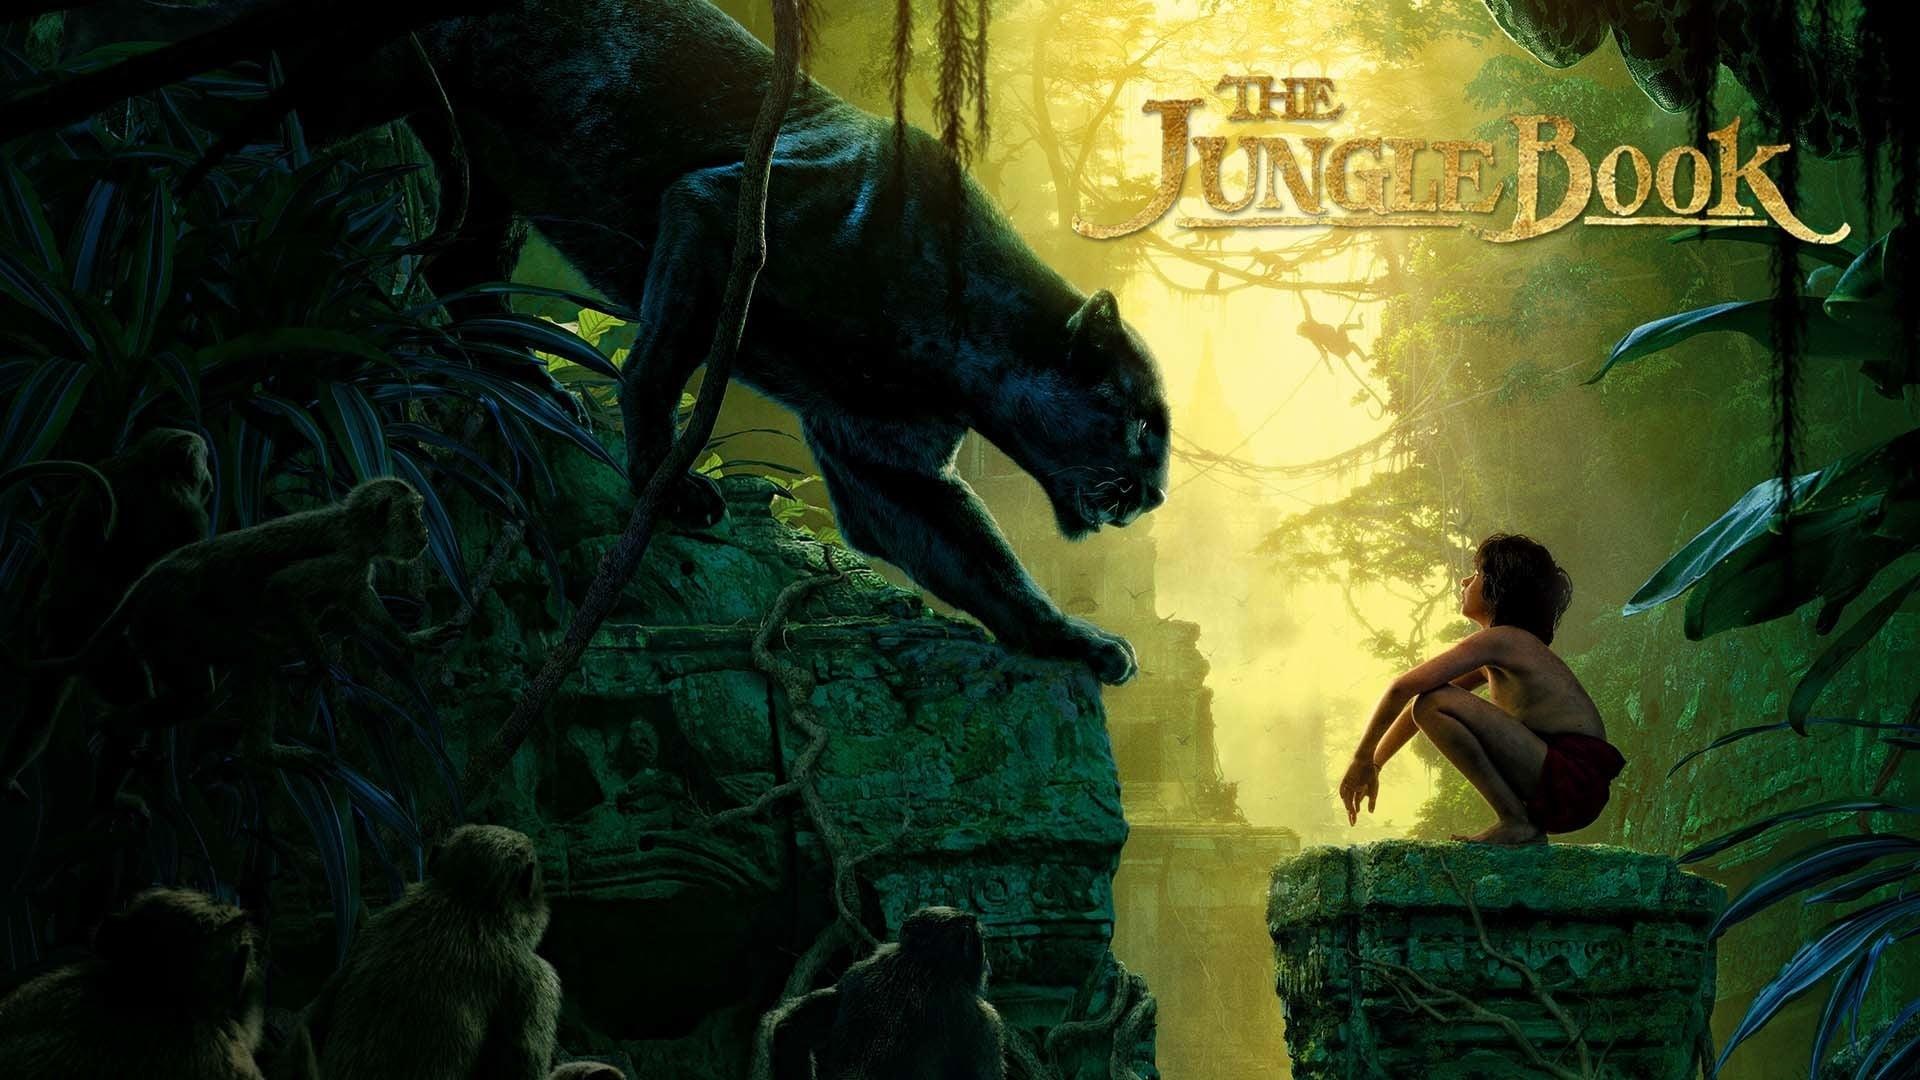 regarder le livre de la jungle film en streaming film en streaming. Black Bedroom Furniture Sets. Home Design Ideas